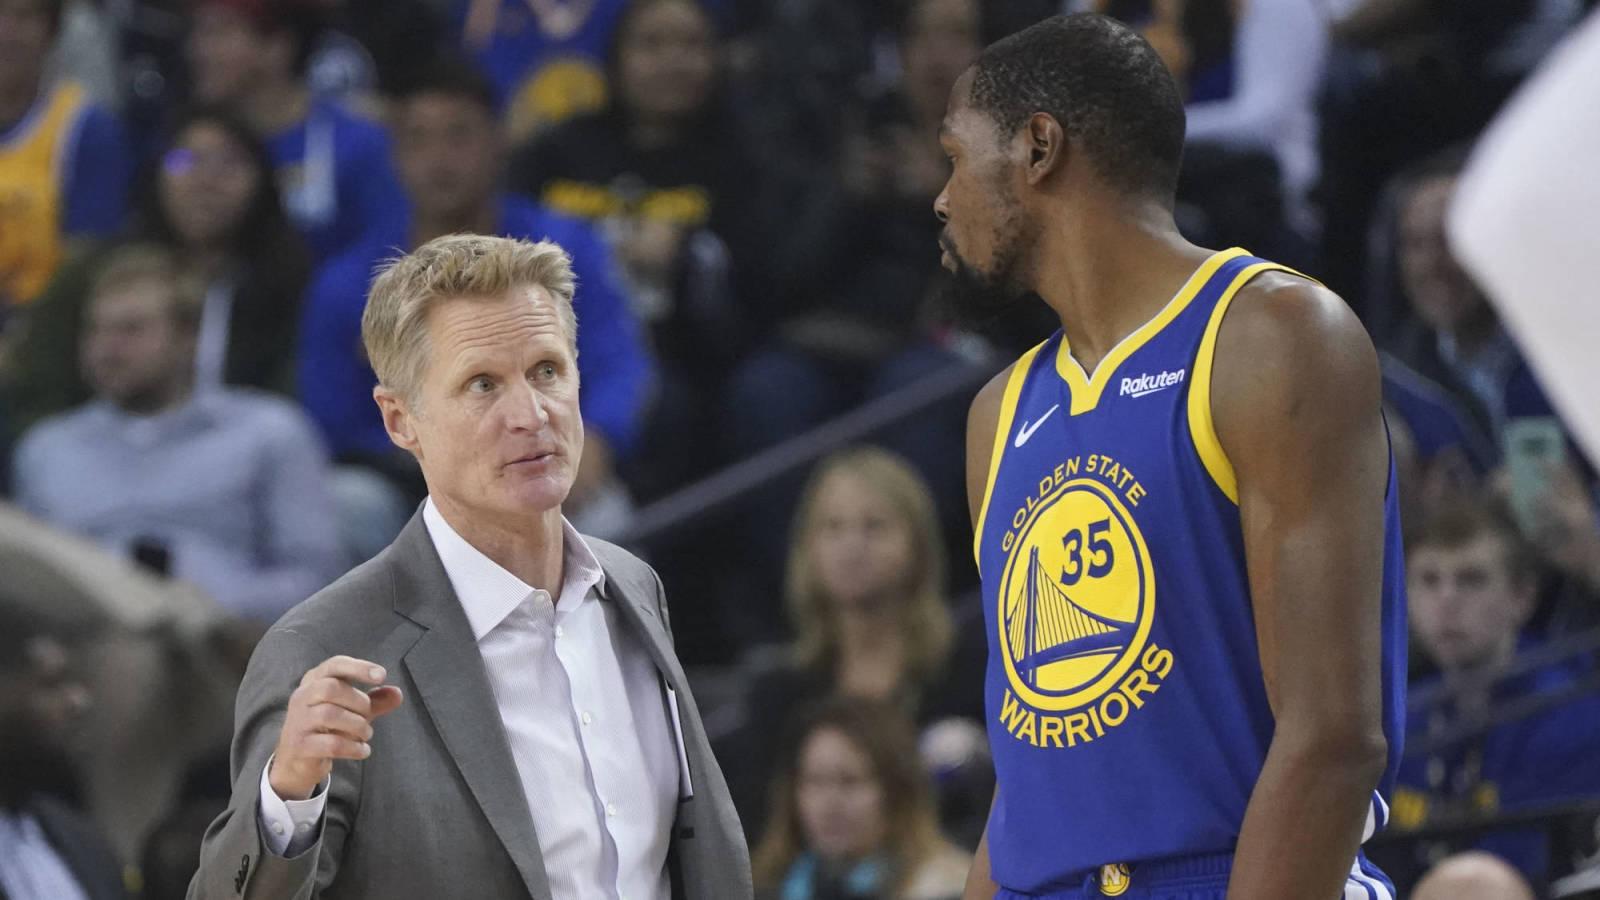 Video surfaces of Steve Kerr motivating Kevin Durant with Michael Jordan-John Paxson story